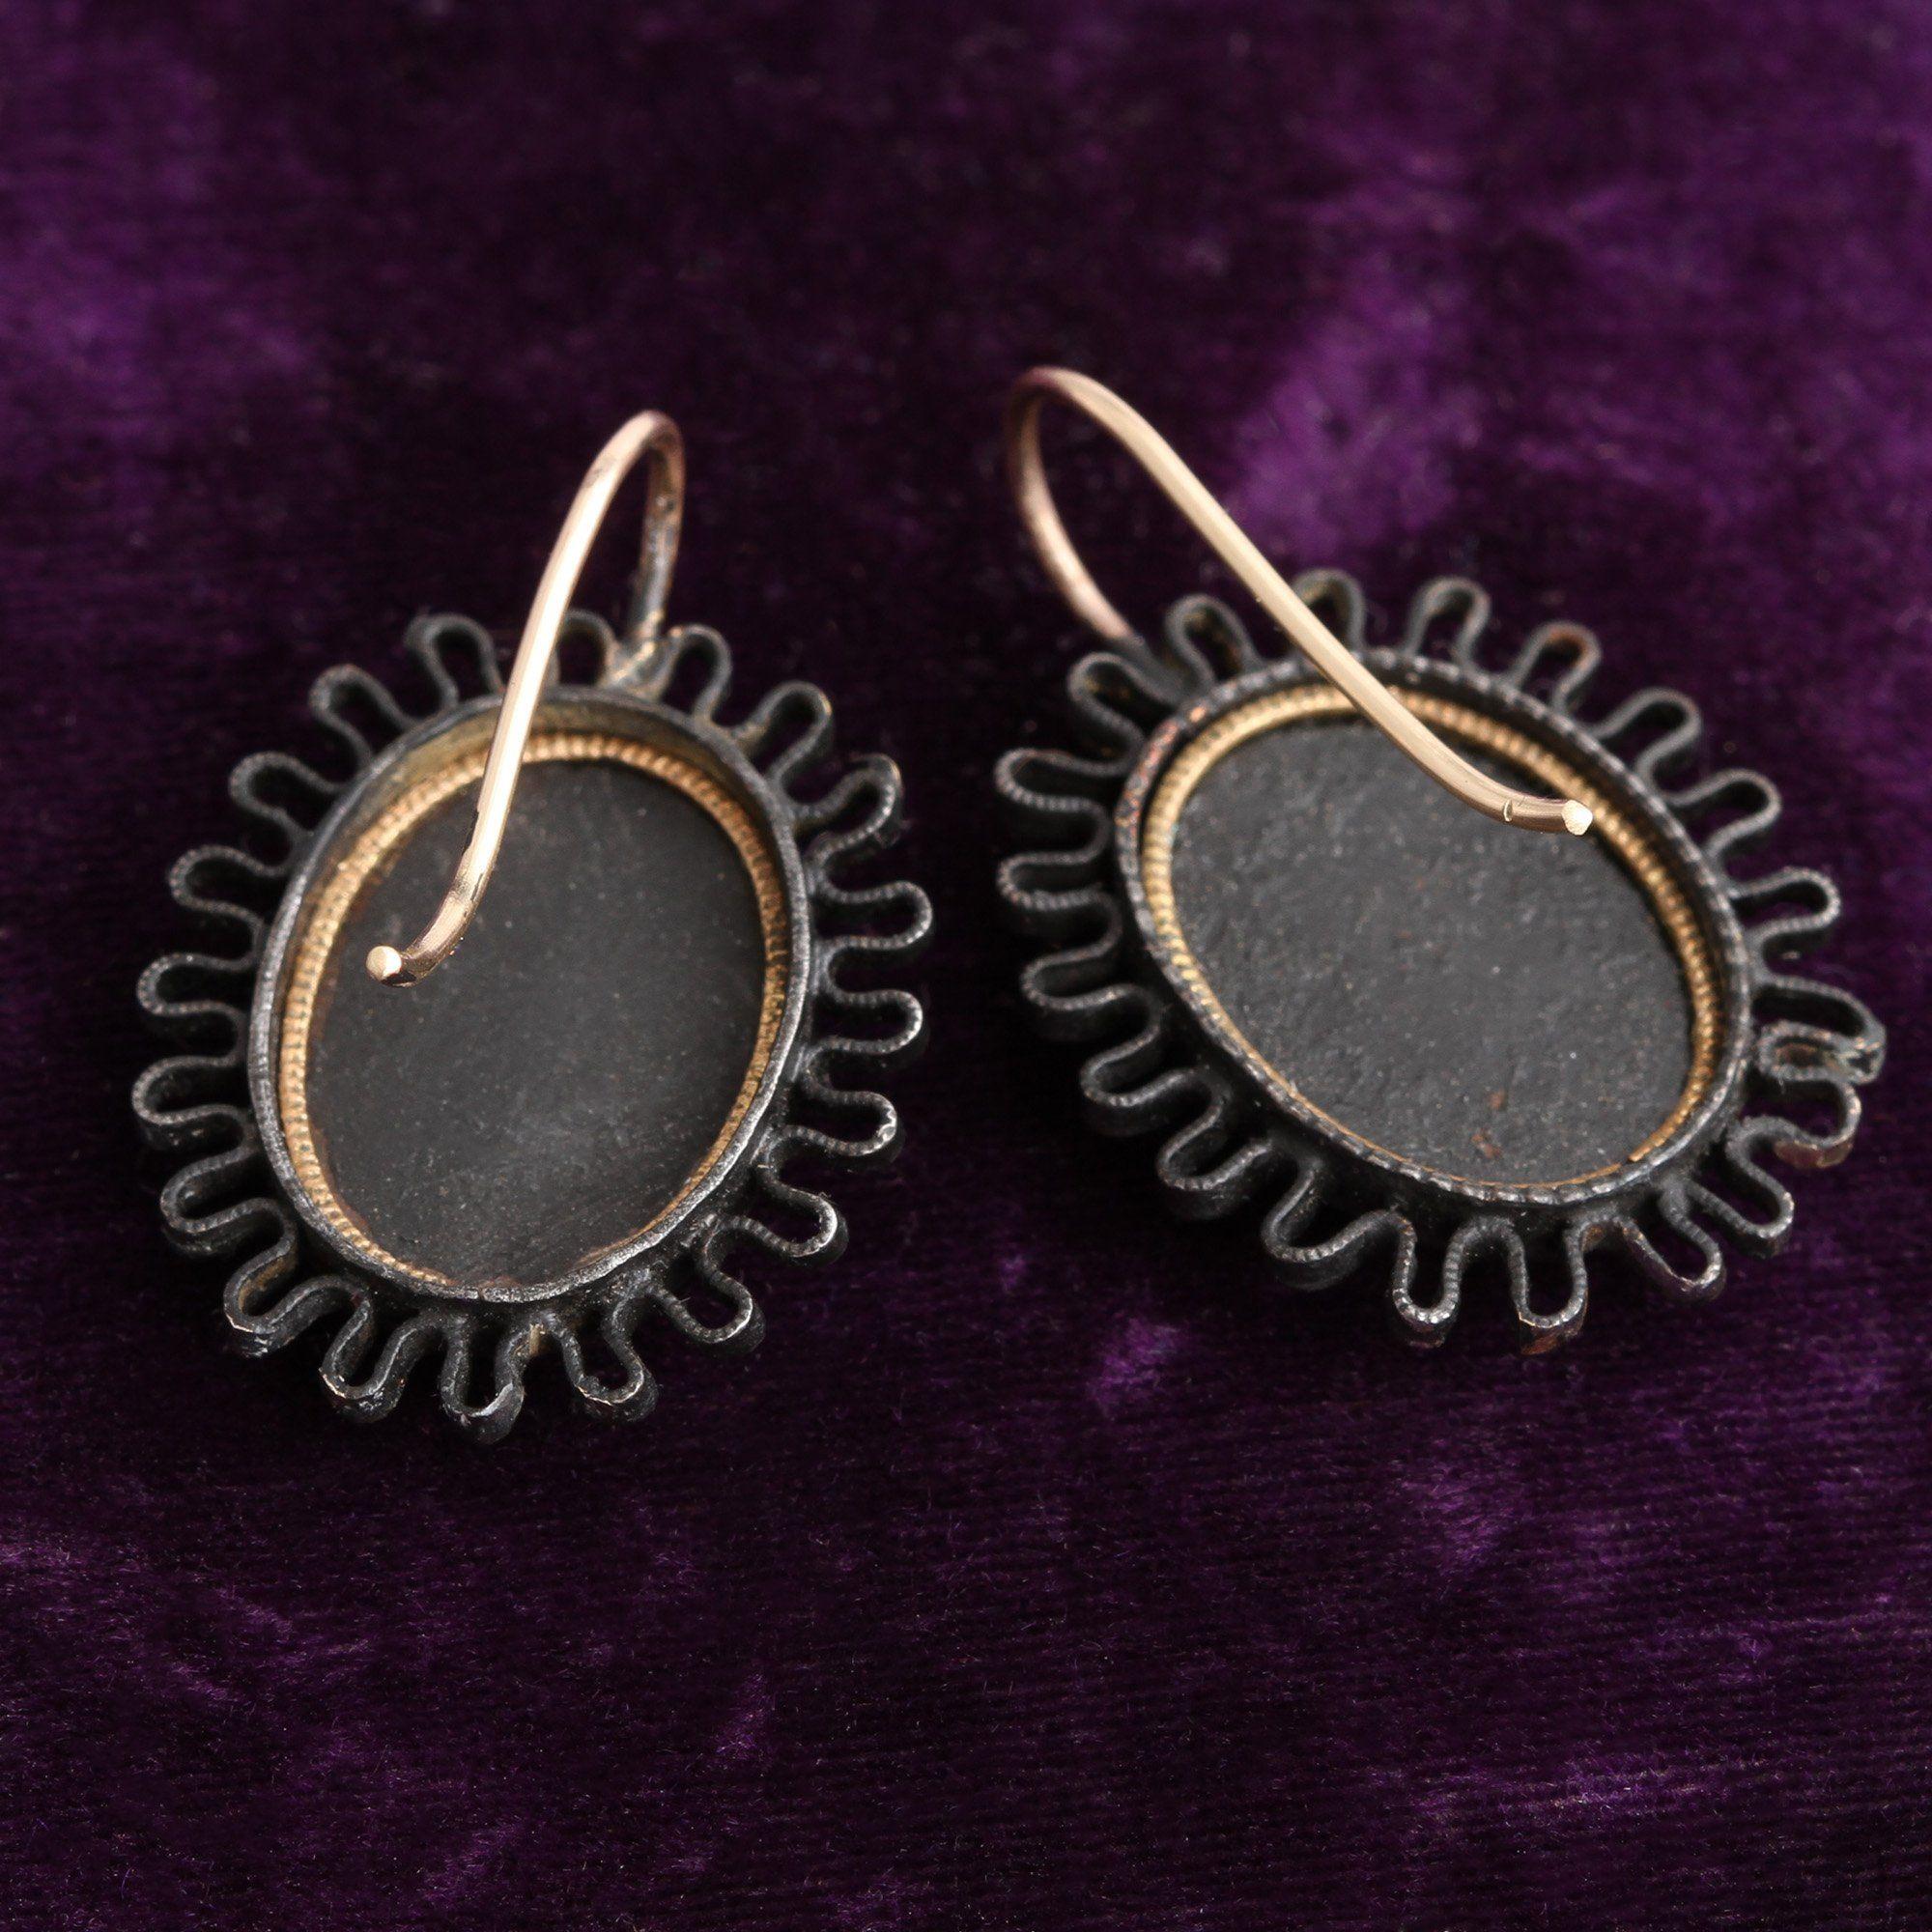 Berlin Iron Neoclassical Cameo Earrings